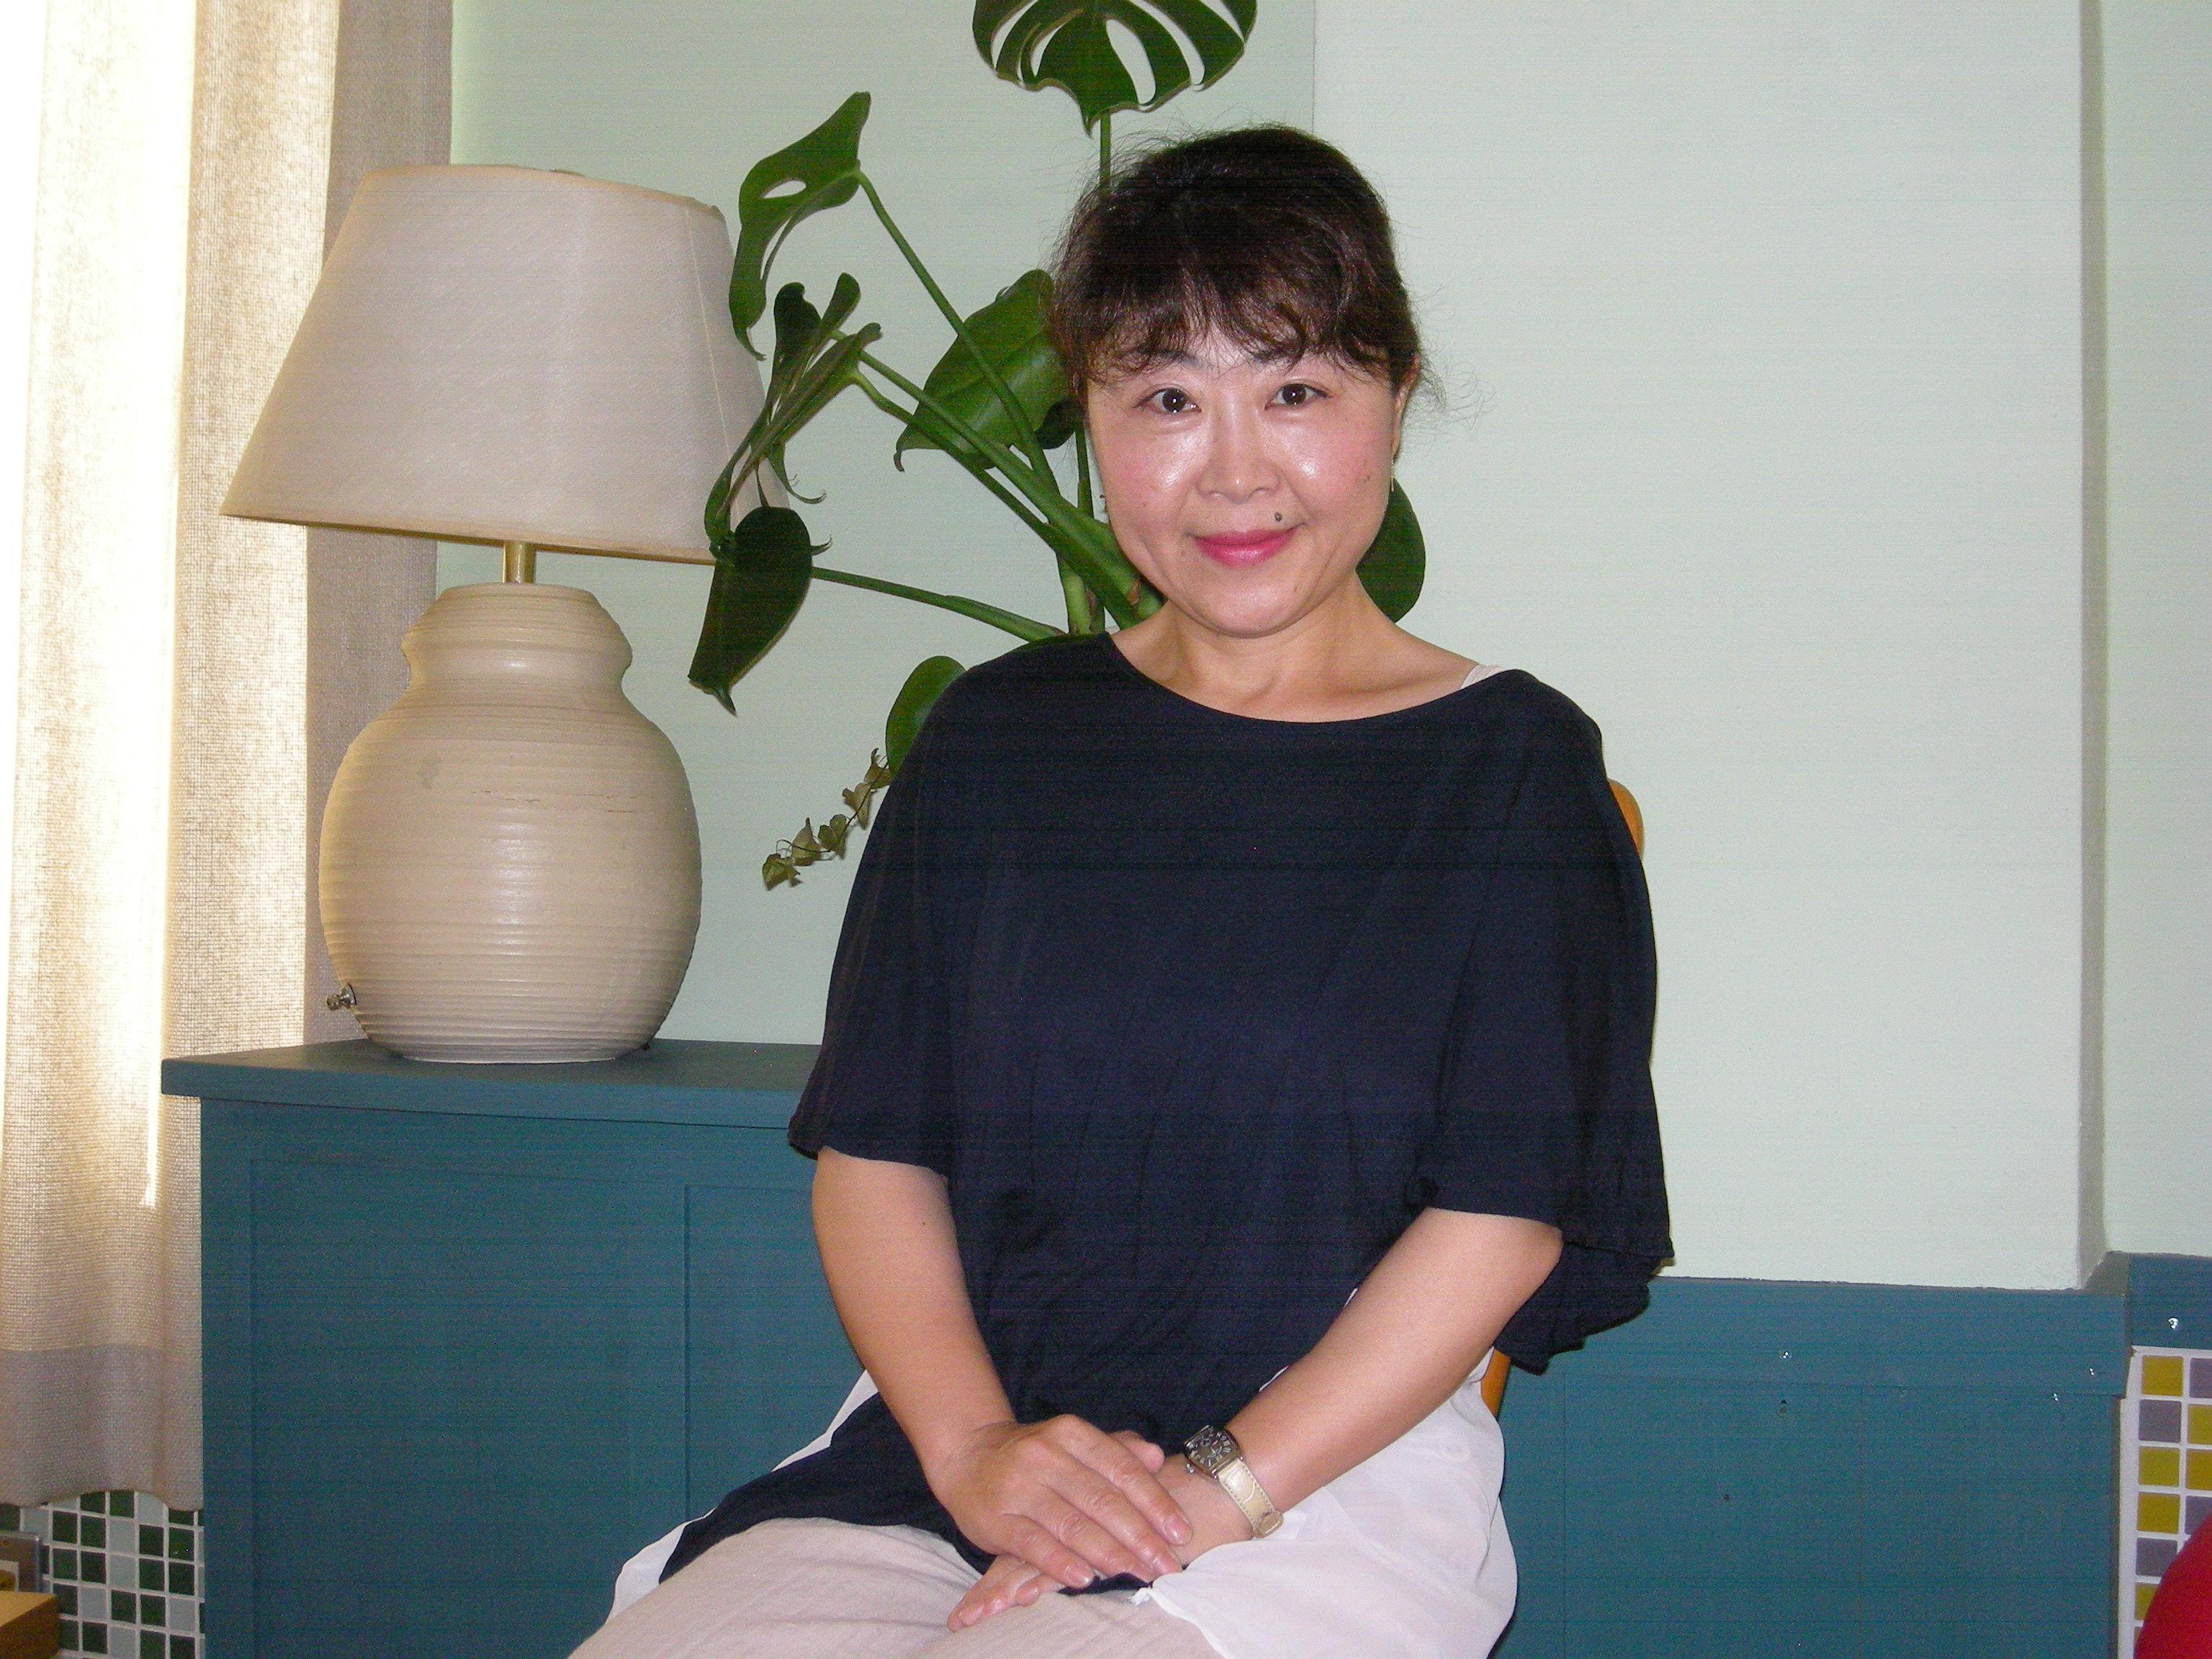 Therapist村上幸子(旧姓: 味岡)